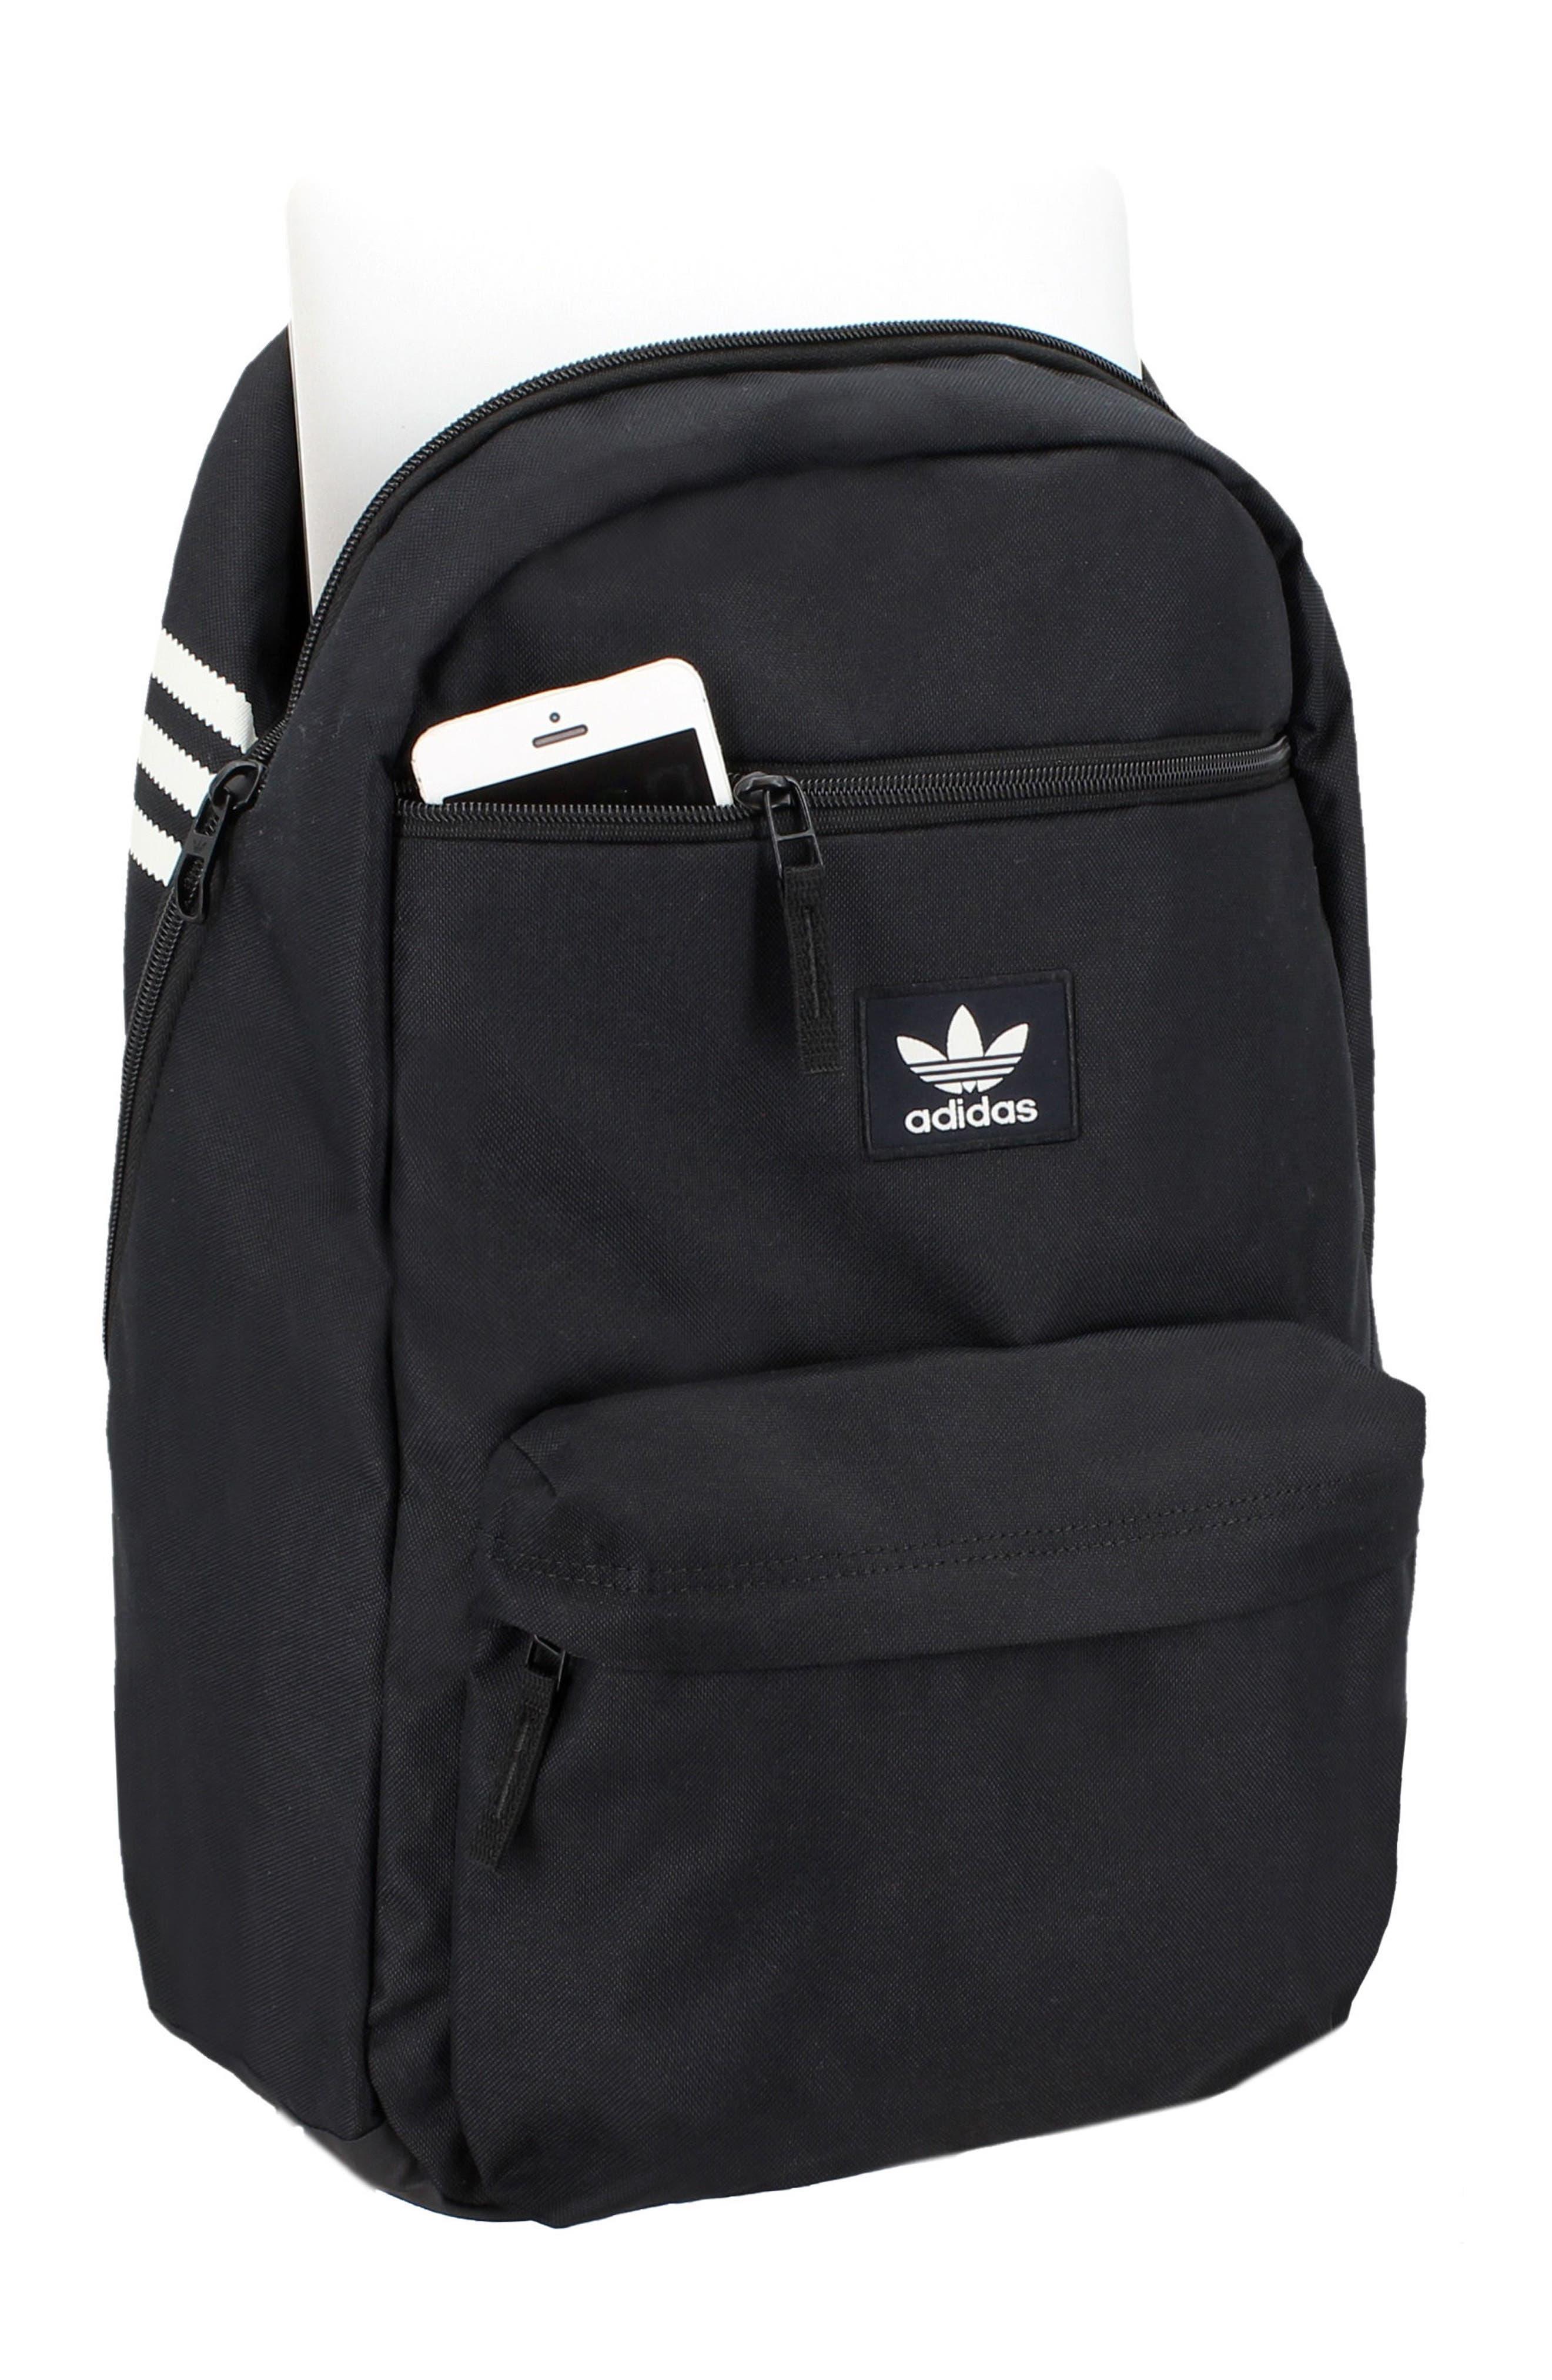 ADIDAS ORIGINALS,                             Nationals Backpack,                             Alternate thumbnail 4, color,                             BLACK